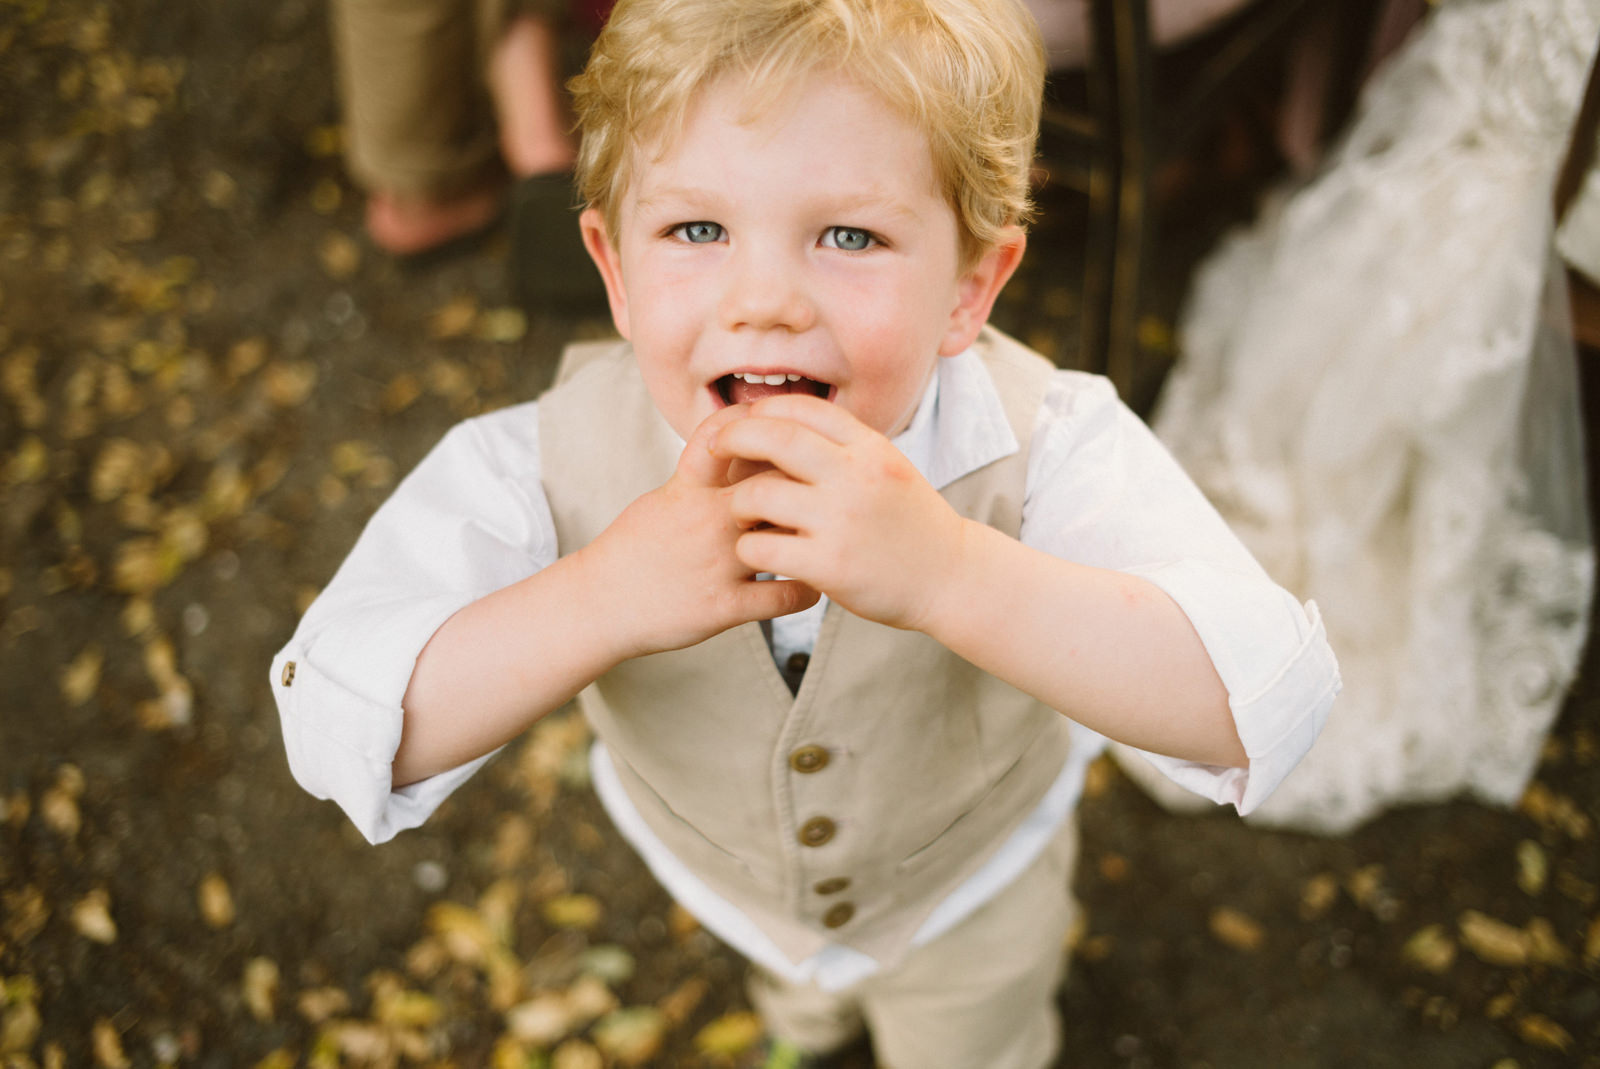 rivers-bend-retreat-wedding-066 RIVER'S BEND RETREAT WEDDING